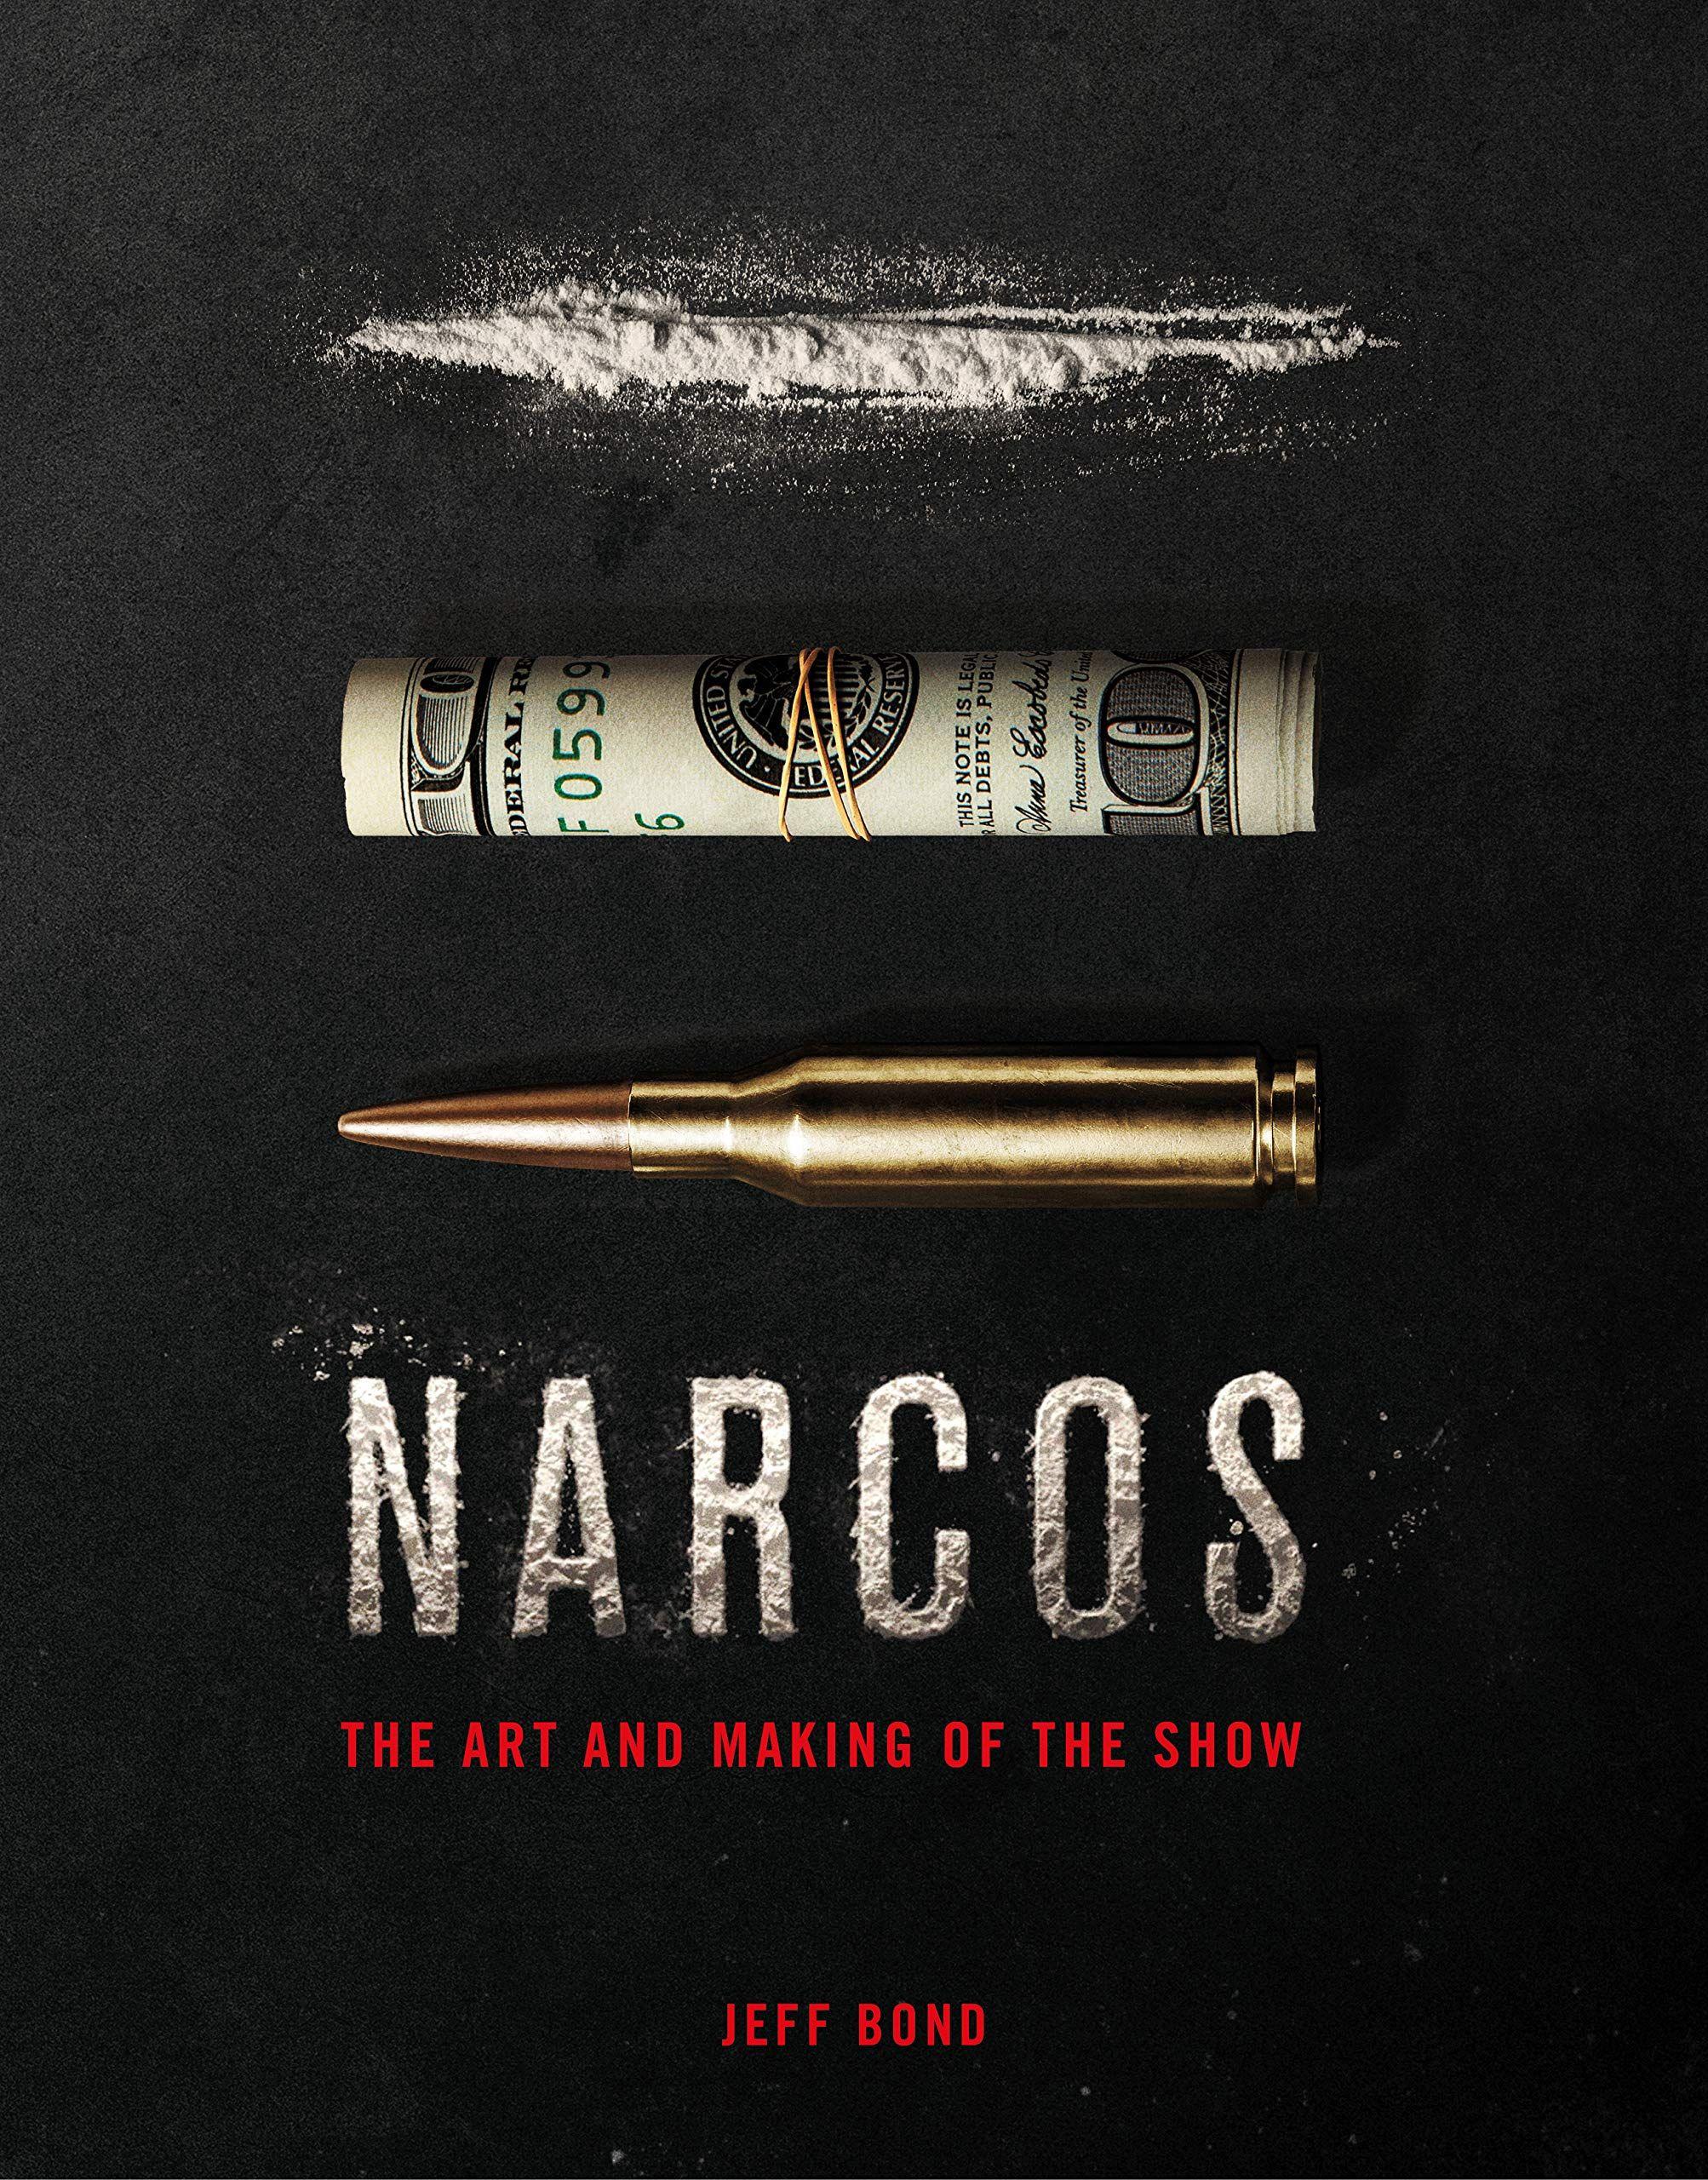 This Narcos Poster Narcos Poster Narcos Wallpaper Narcos Netflix